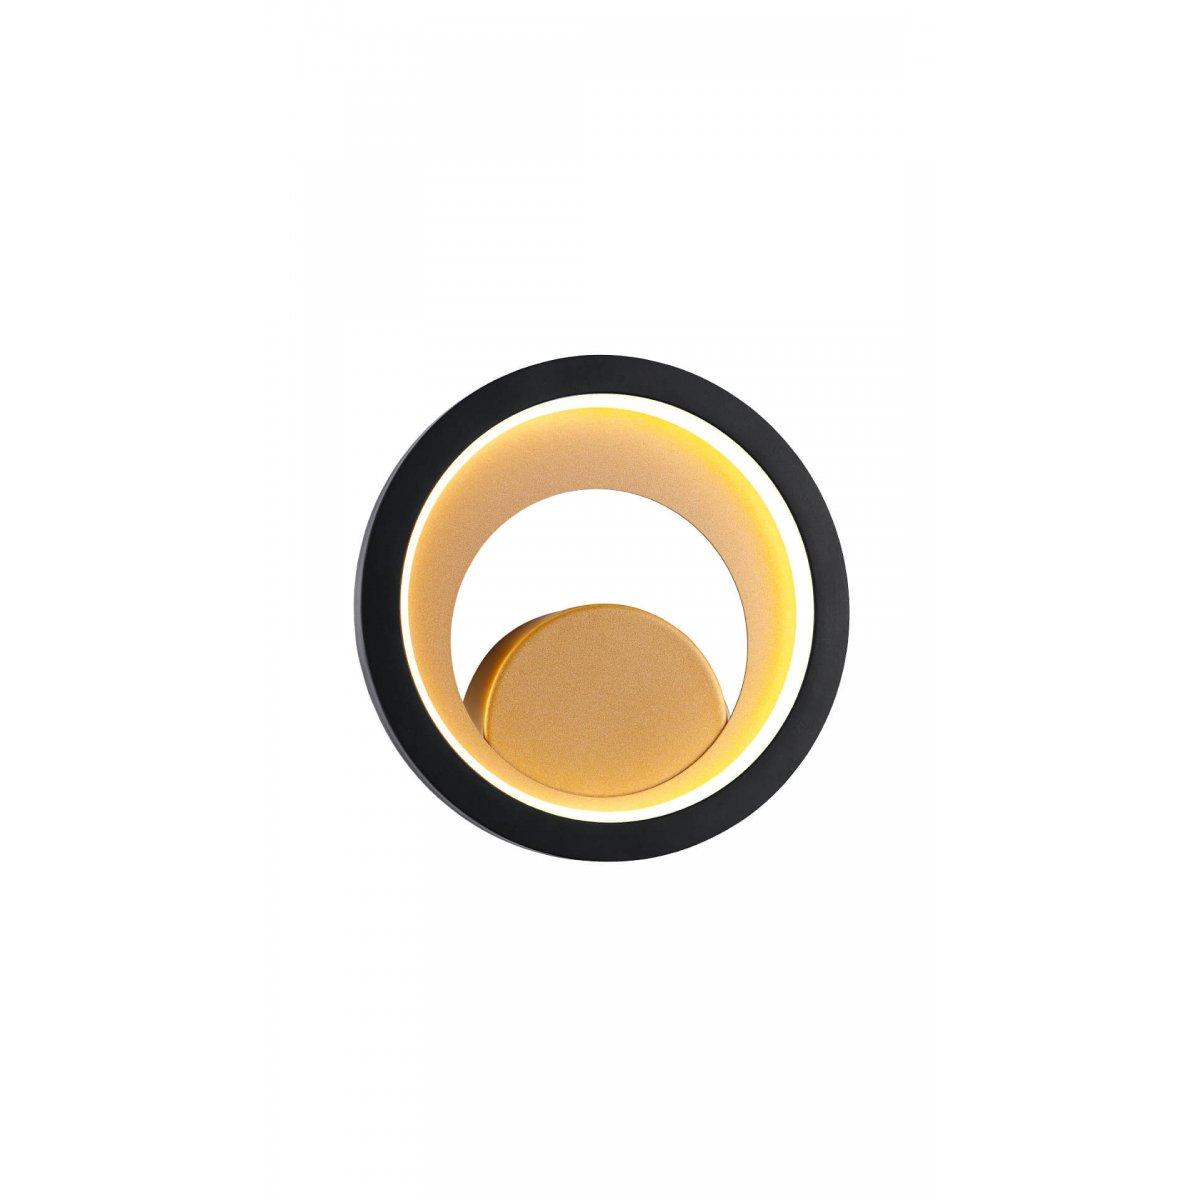 Aplică interior LED CRYPTIC AP1 negru & gold - Unique by Klausen